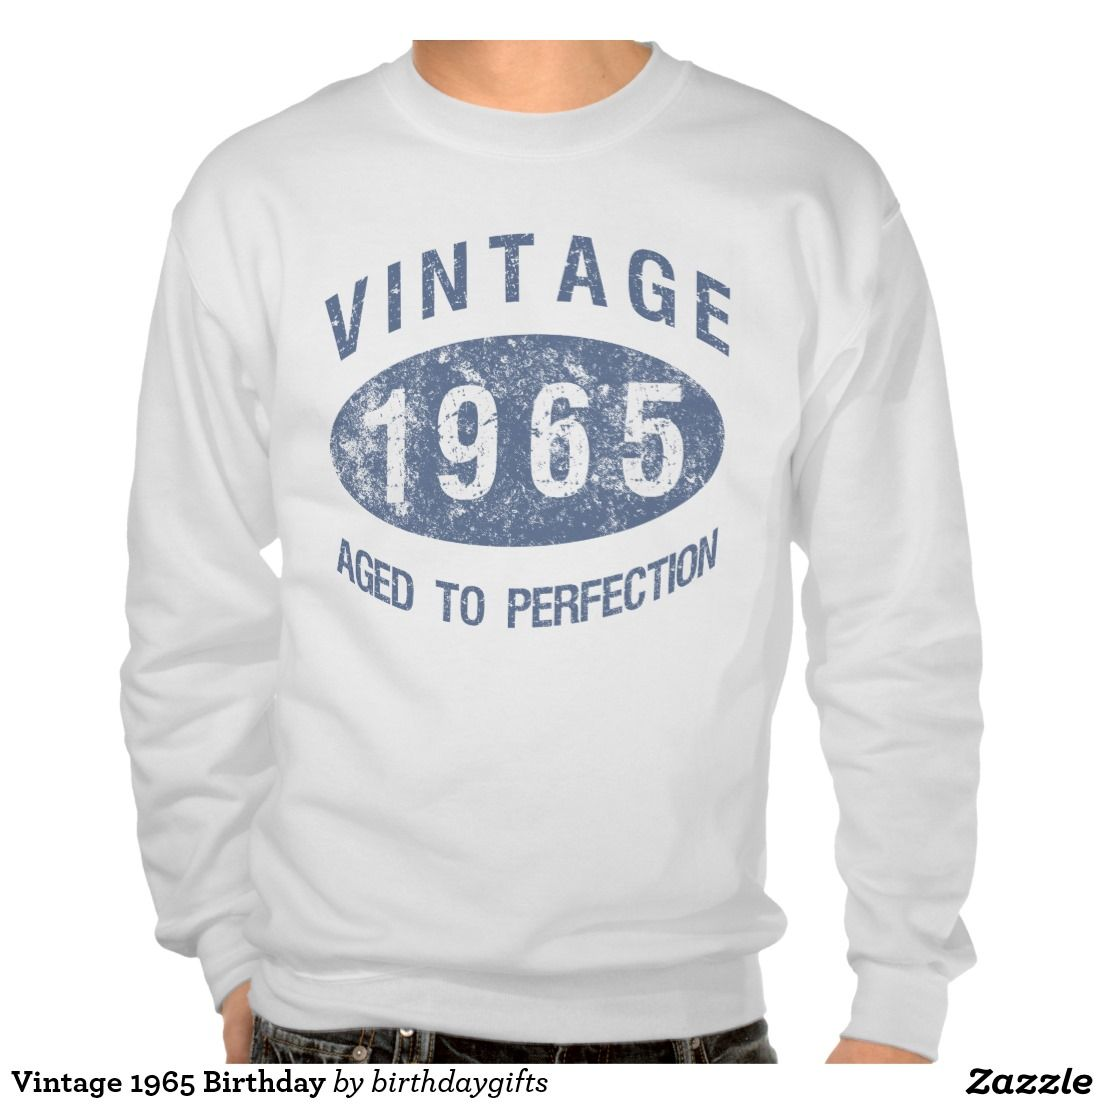 Vintage 1965 Birthday Pullover Sweatshirts